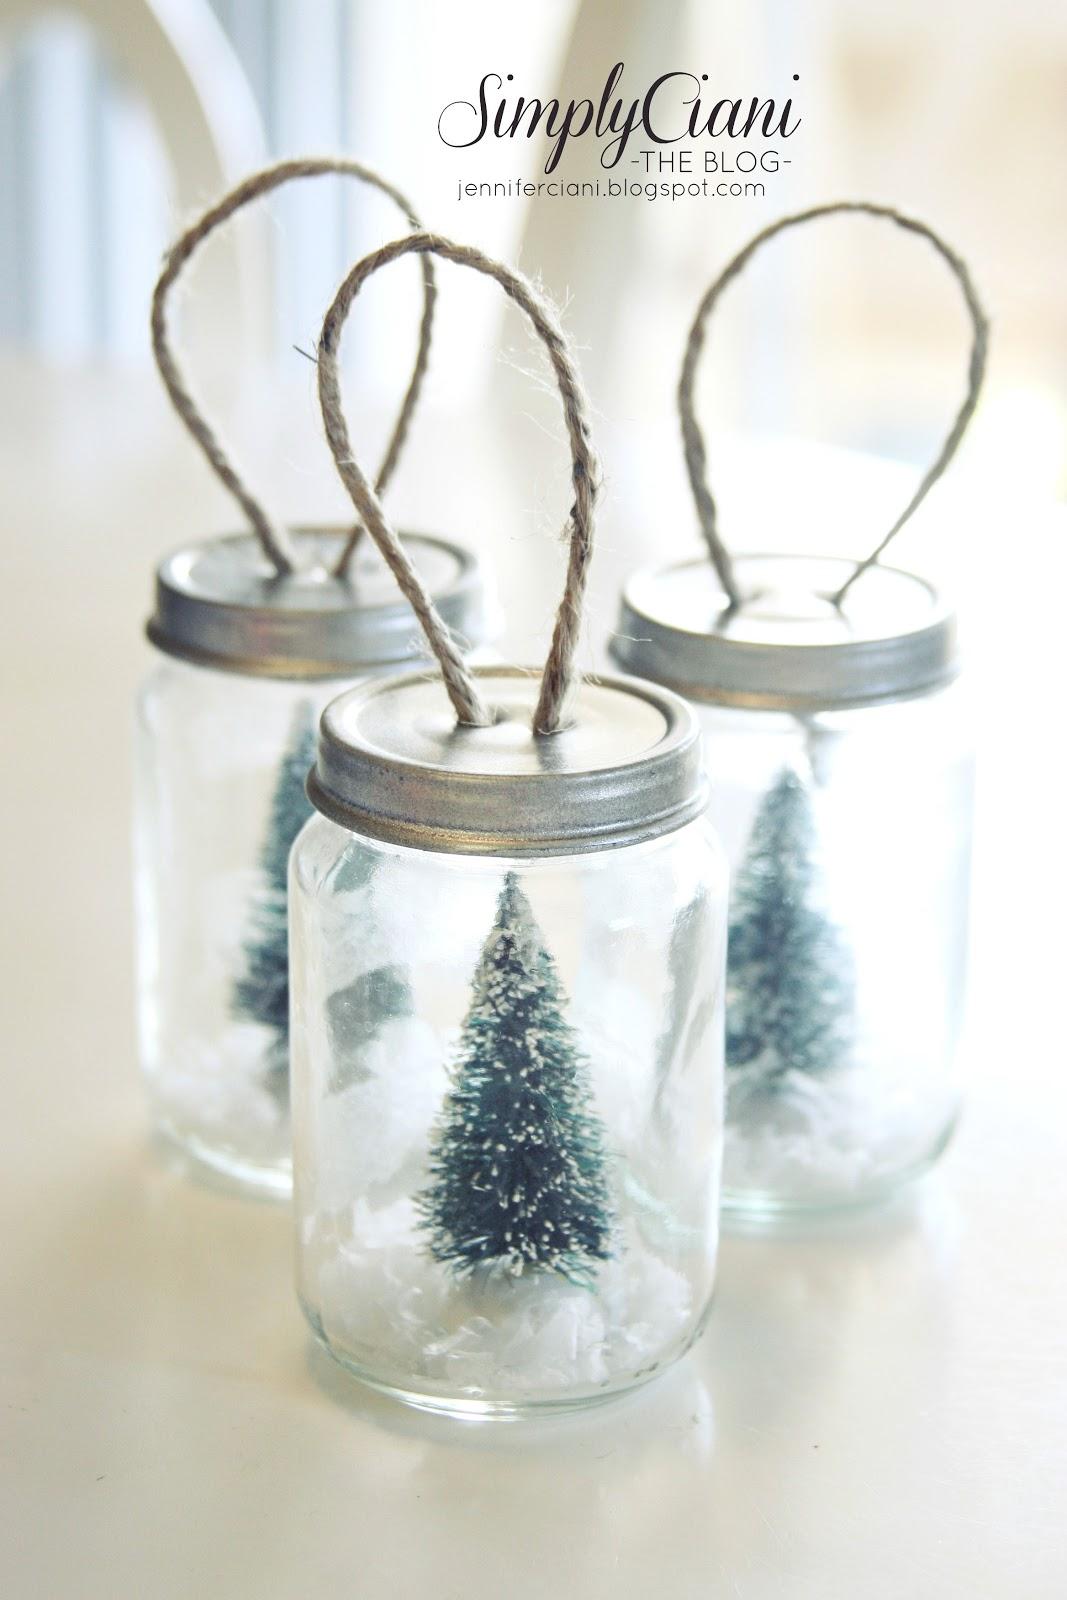 Mason jar ornaments - Adorable Little Mason Jar Snow Globe Ornaments